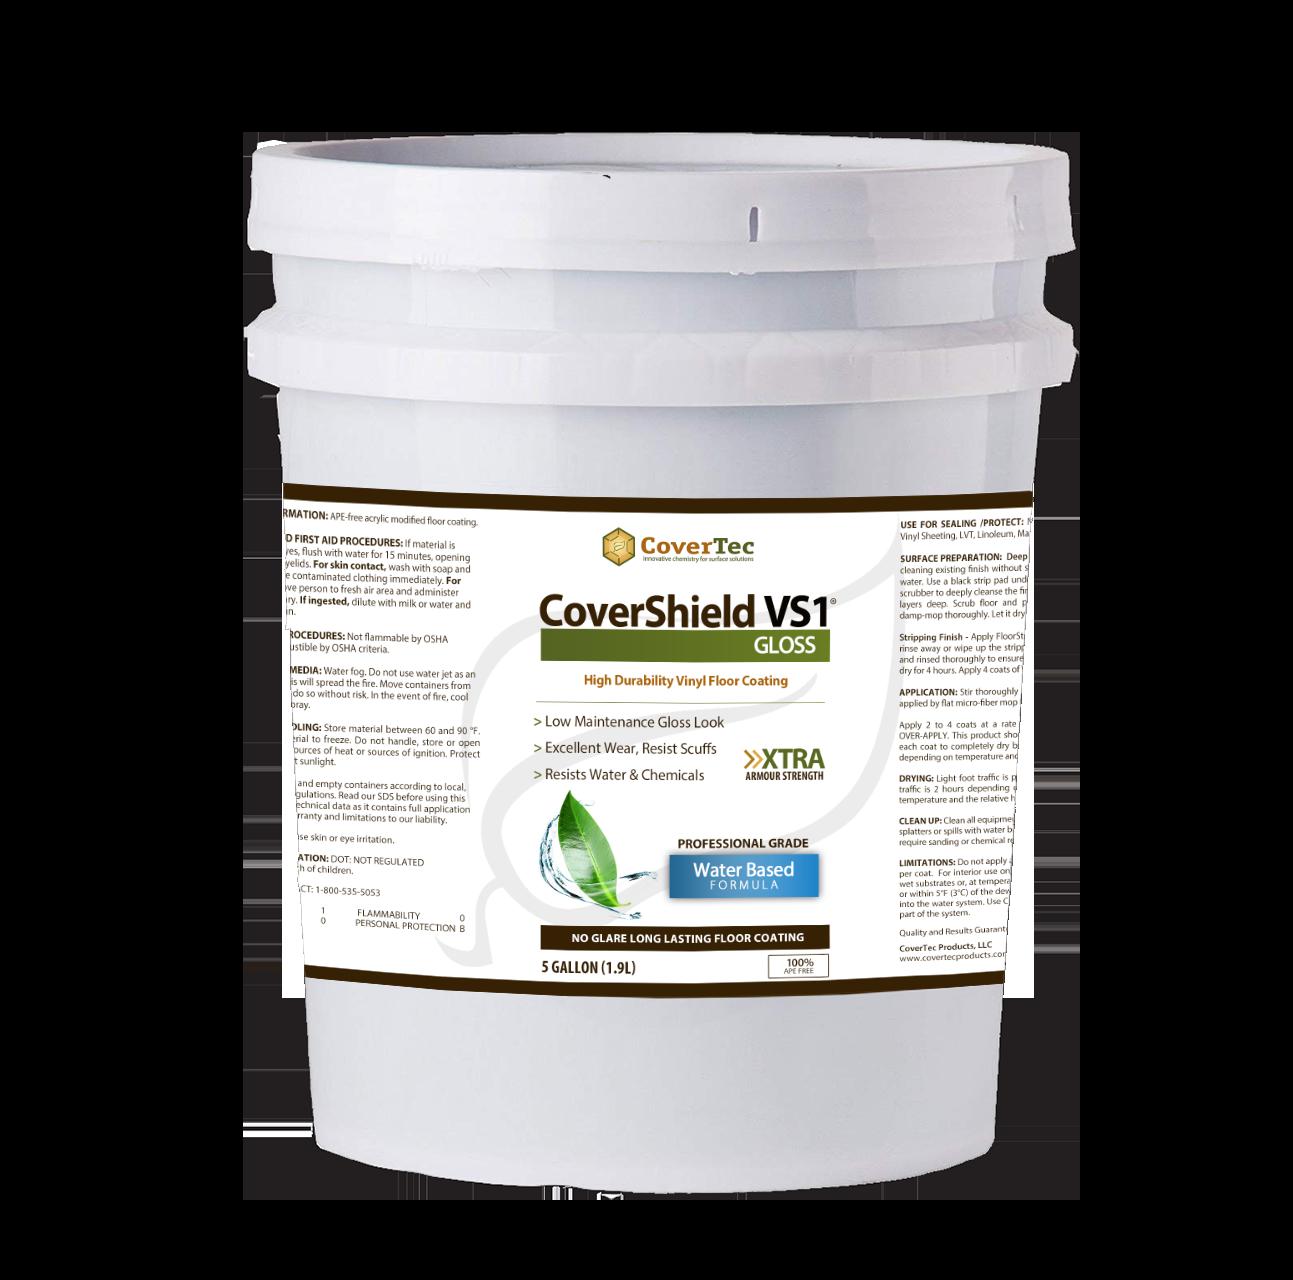 CoverShield VS1 Fast Drying 1 Part Coating H/Gloss